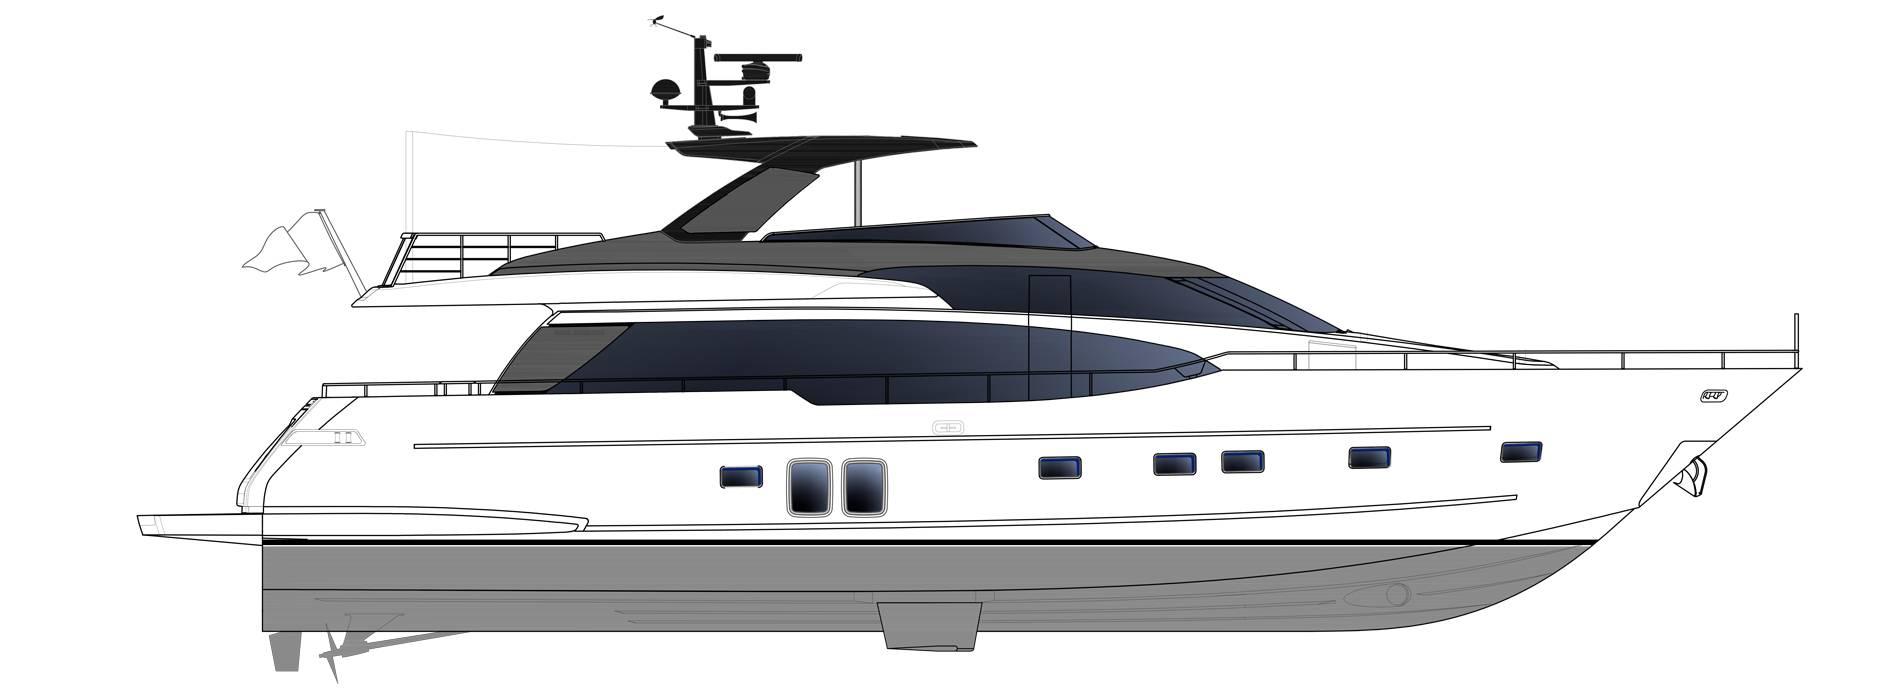 Sanlorenzo Yachts SL78-695 外观